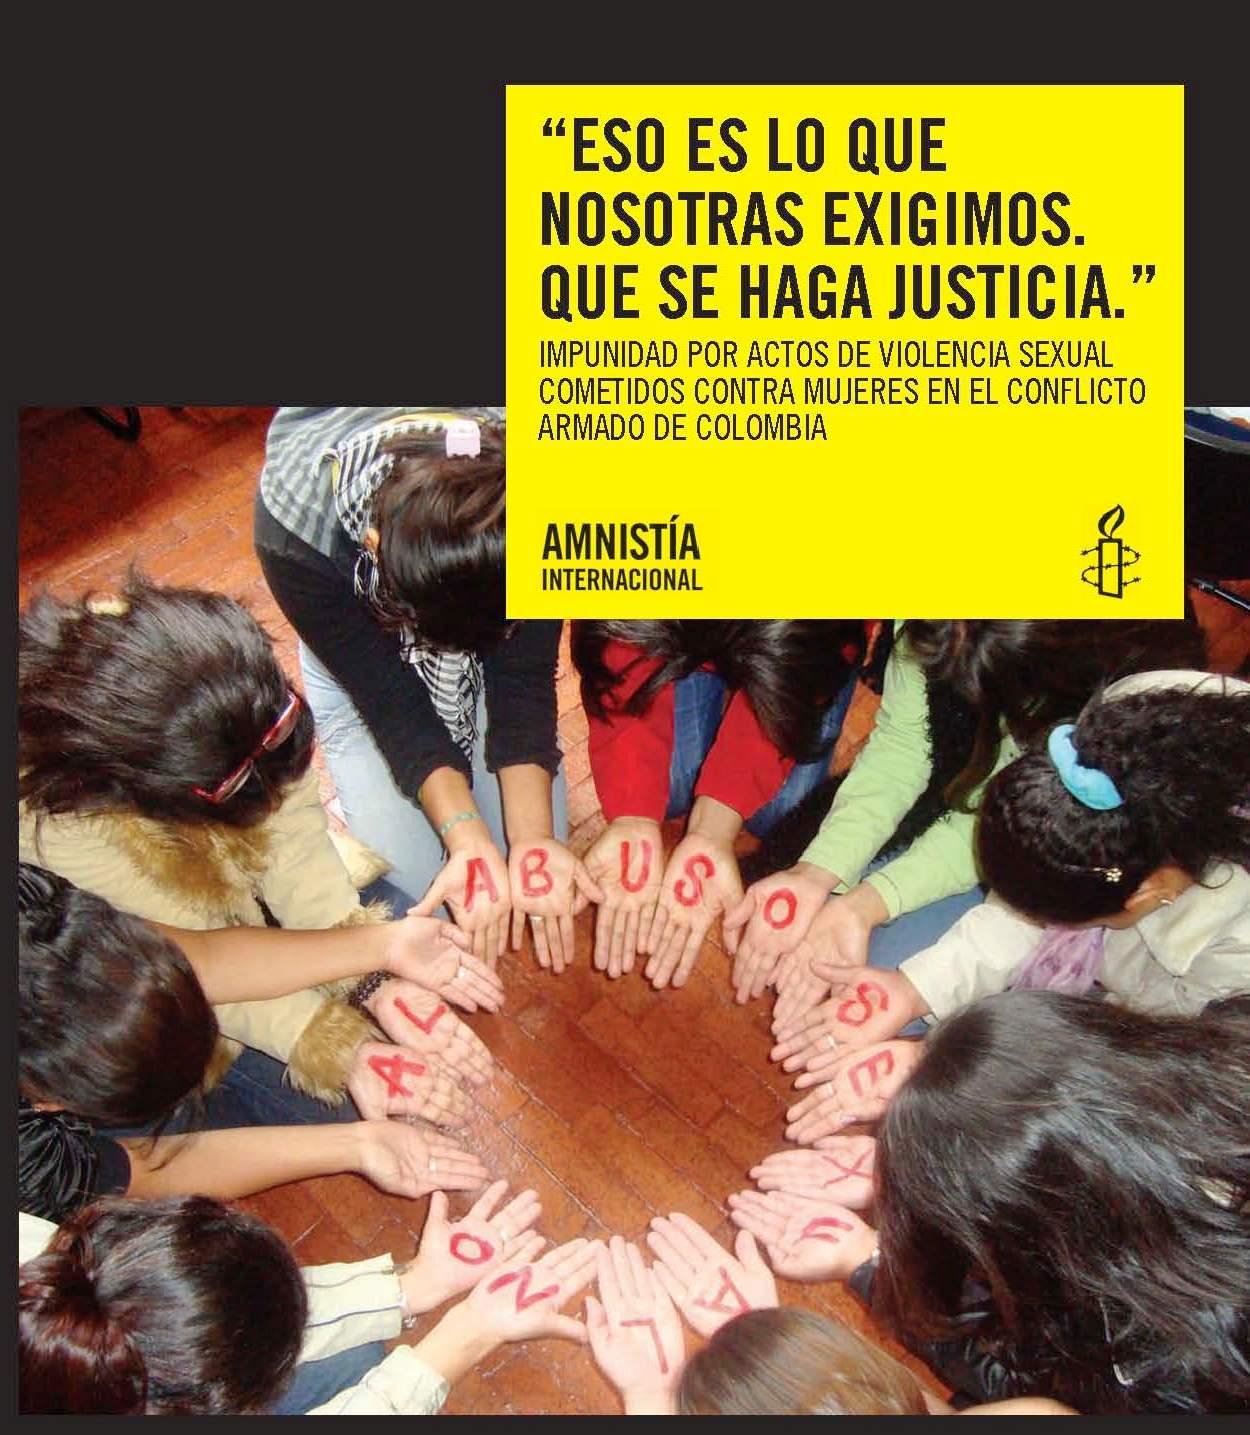 Andrea Naranjo 2013-15-1genero